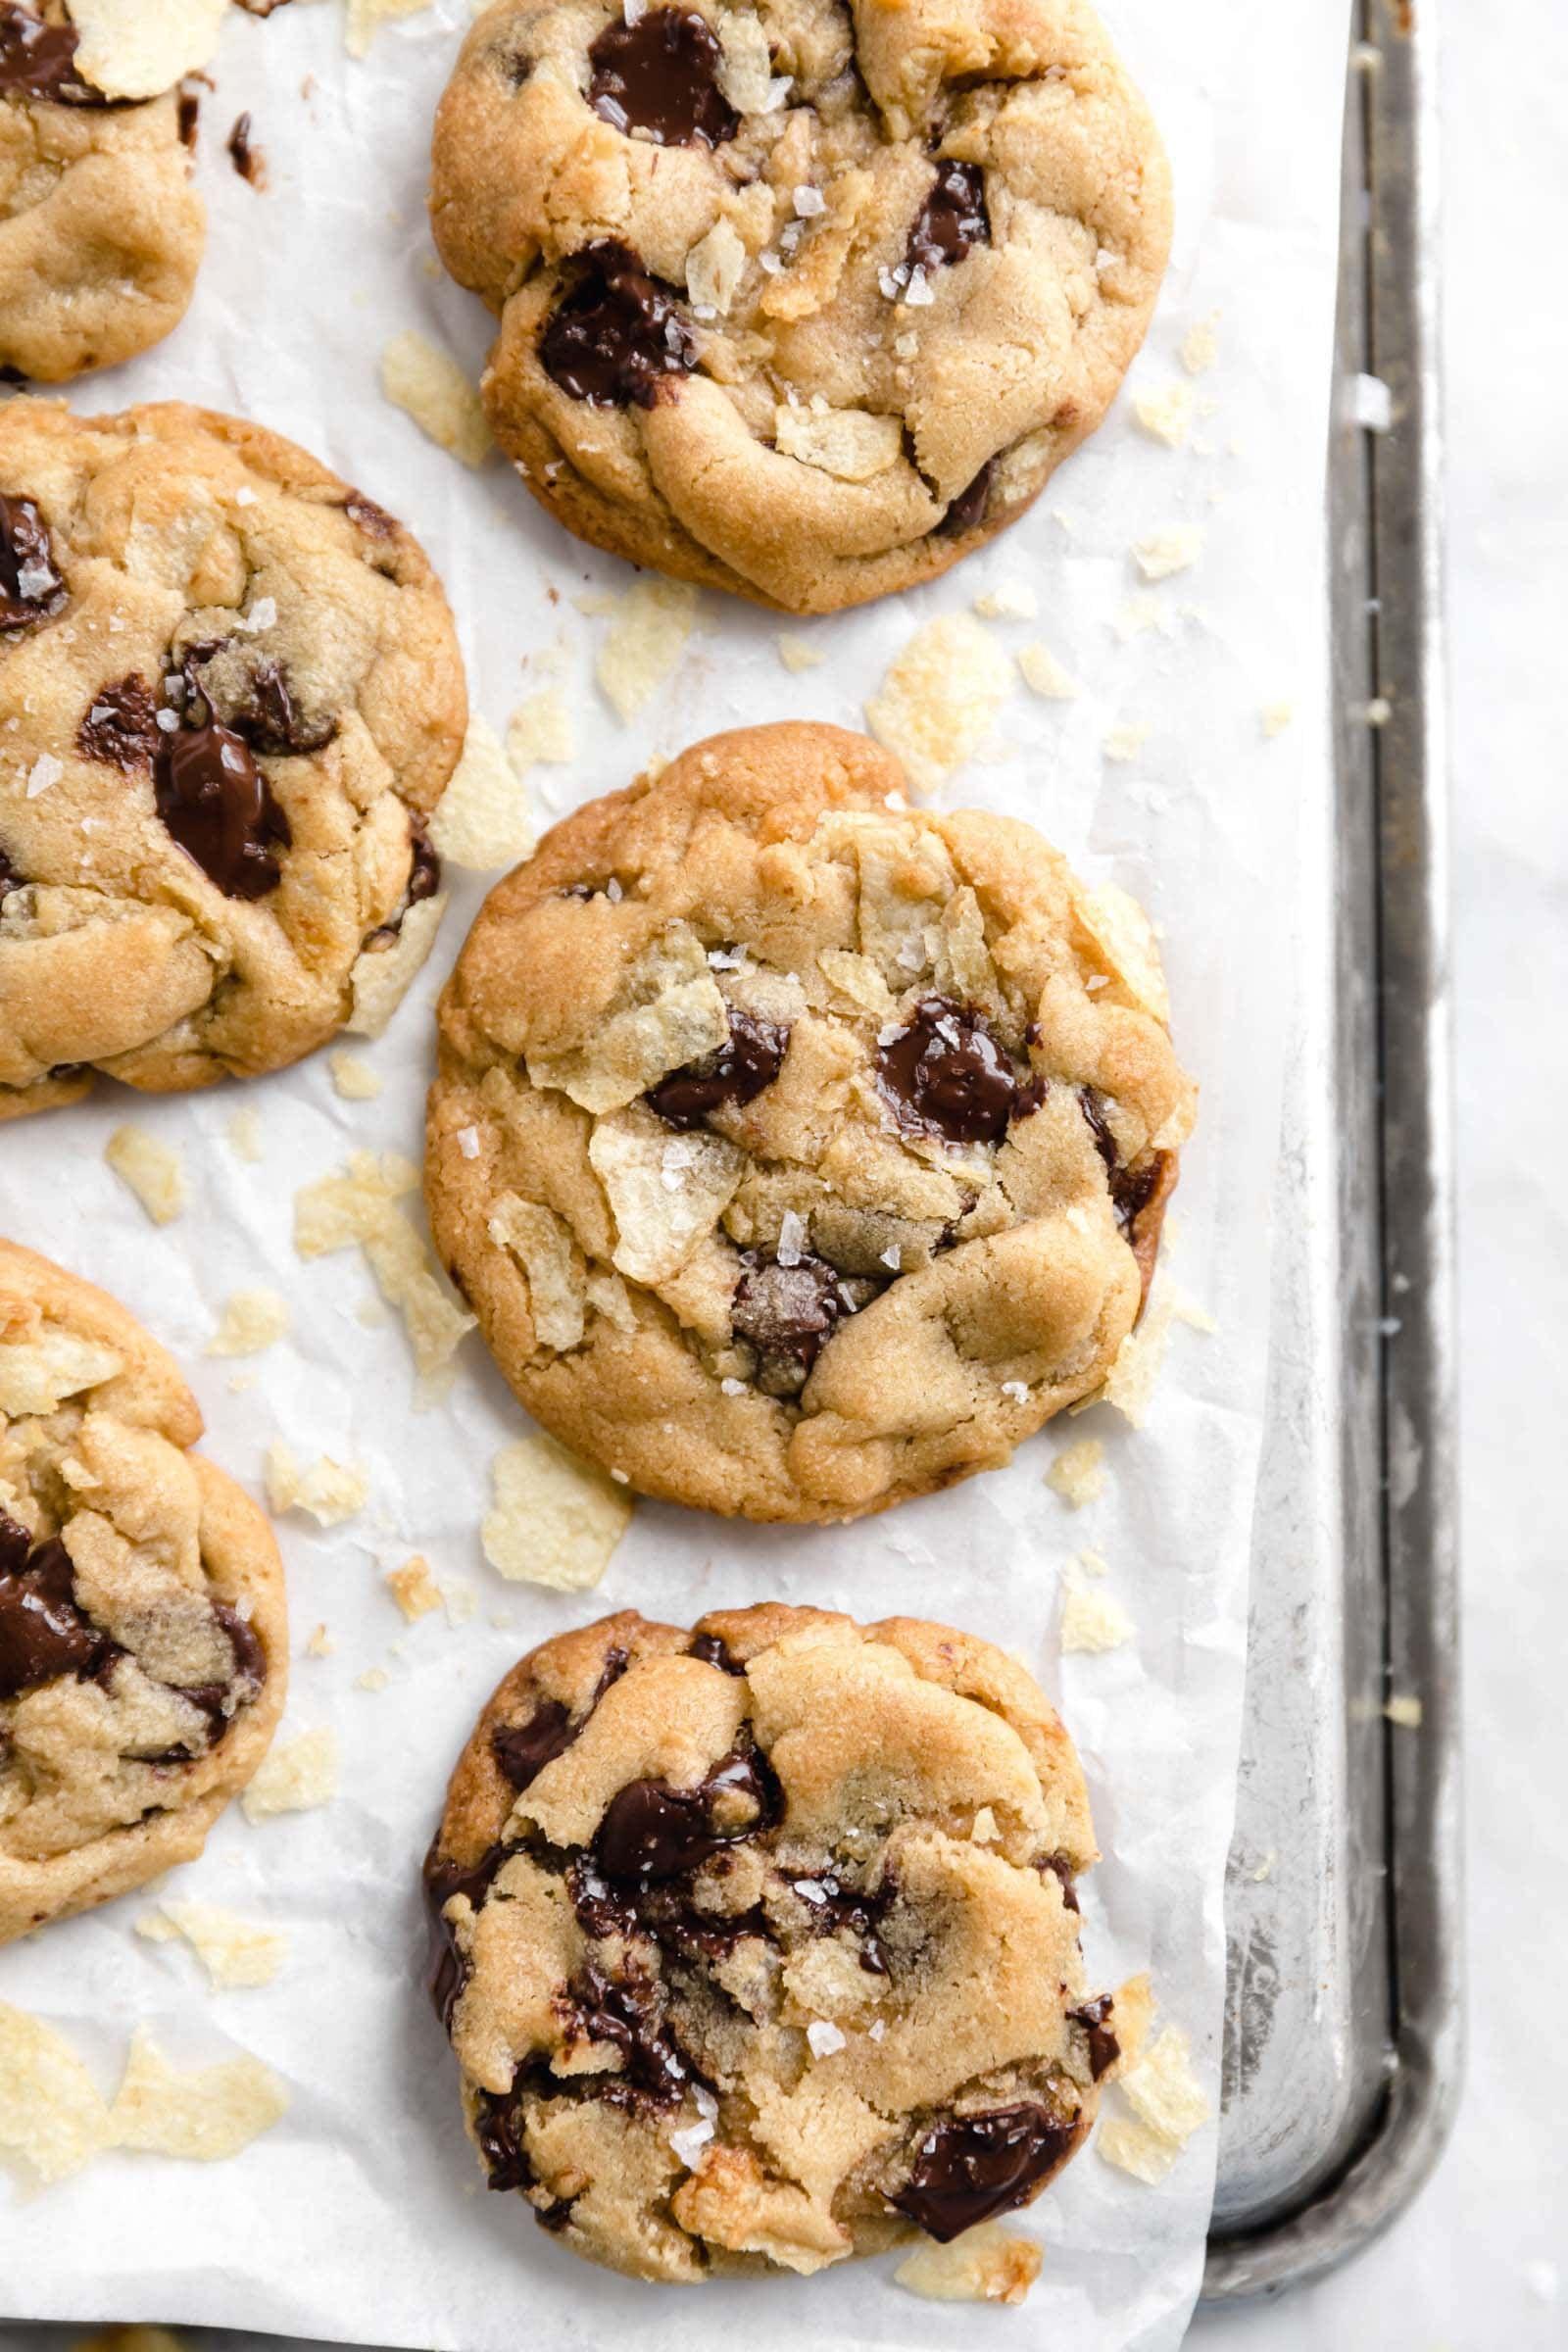 Potato Chip Chocolate Chip Cookies - Broma Bakery